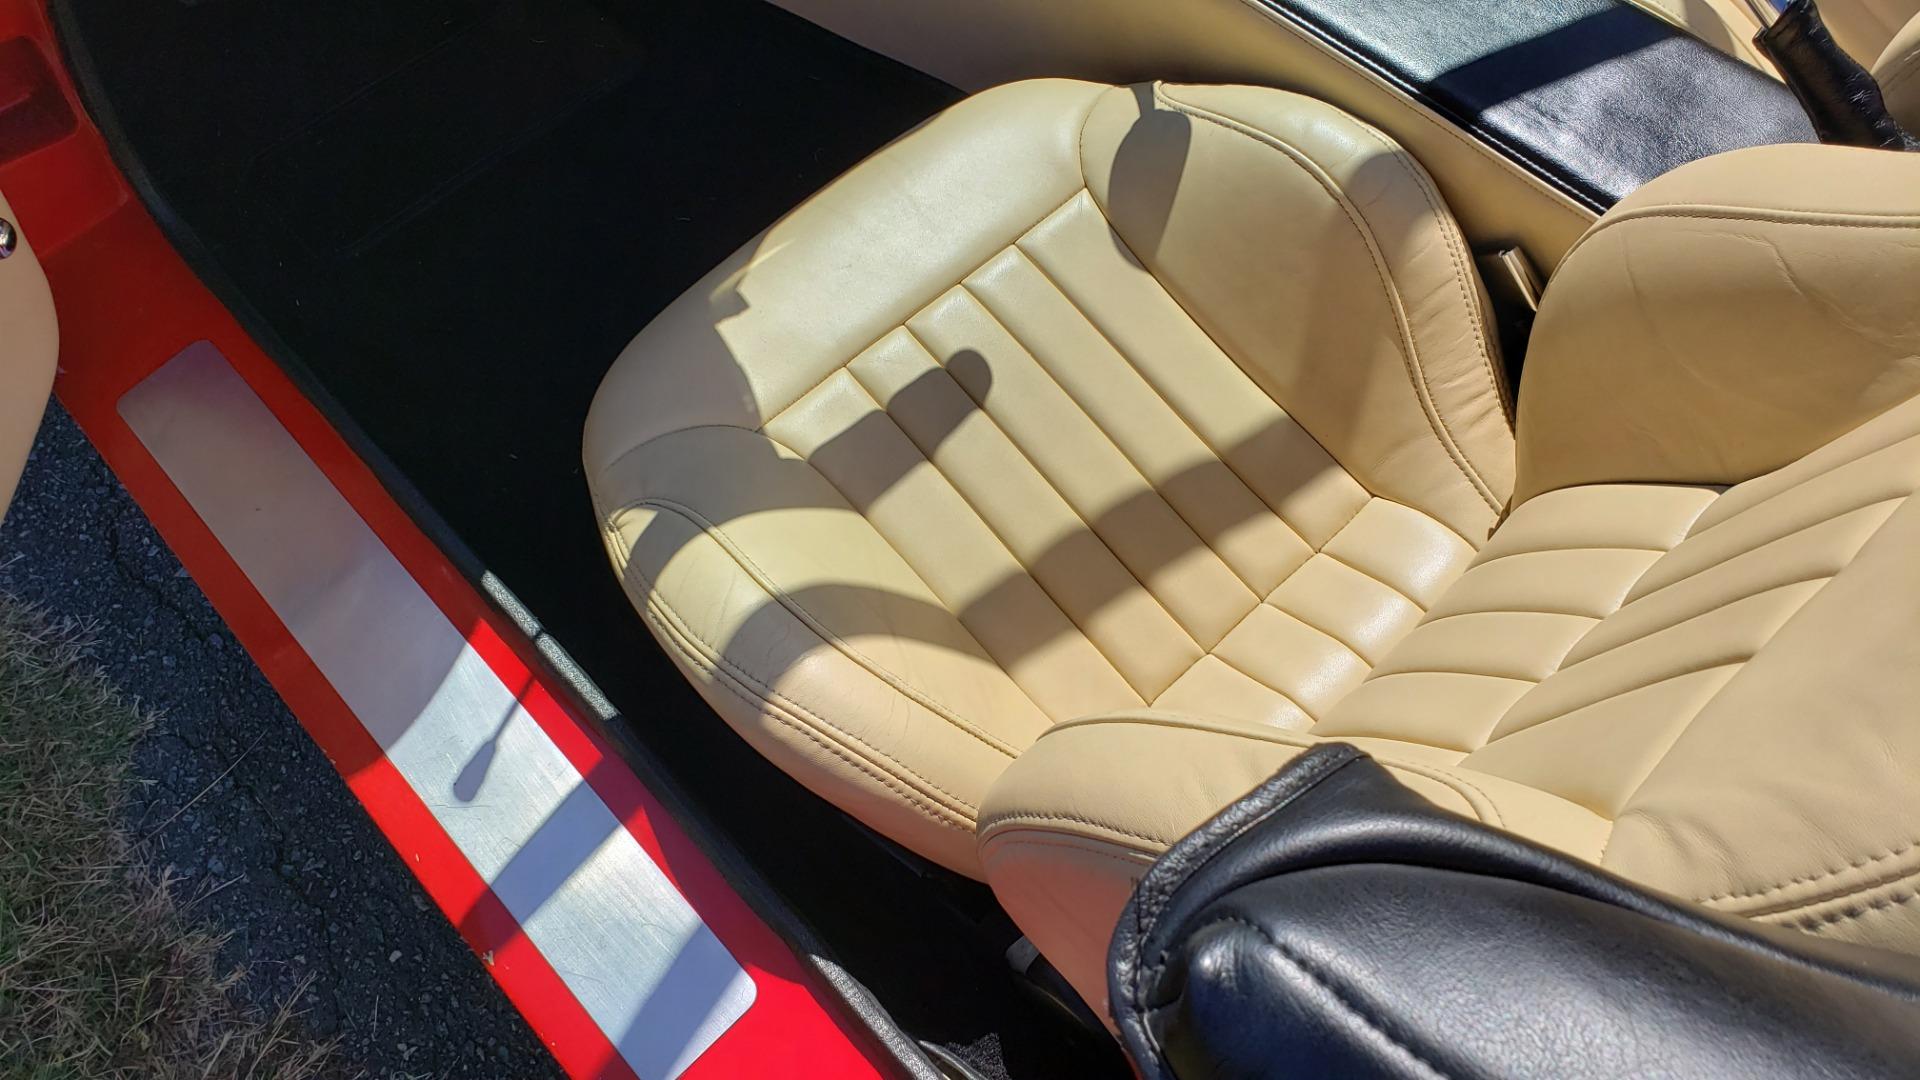 Used 1961 Ferrari 250GT SWB CALIFORNIA REPLICA / 302CI V8 / TREMEC 5-SPEED for sale Sold at Formula Imports in Charlotte NC 28227 38